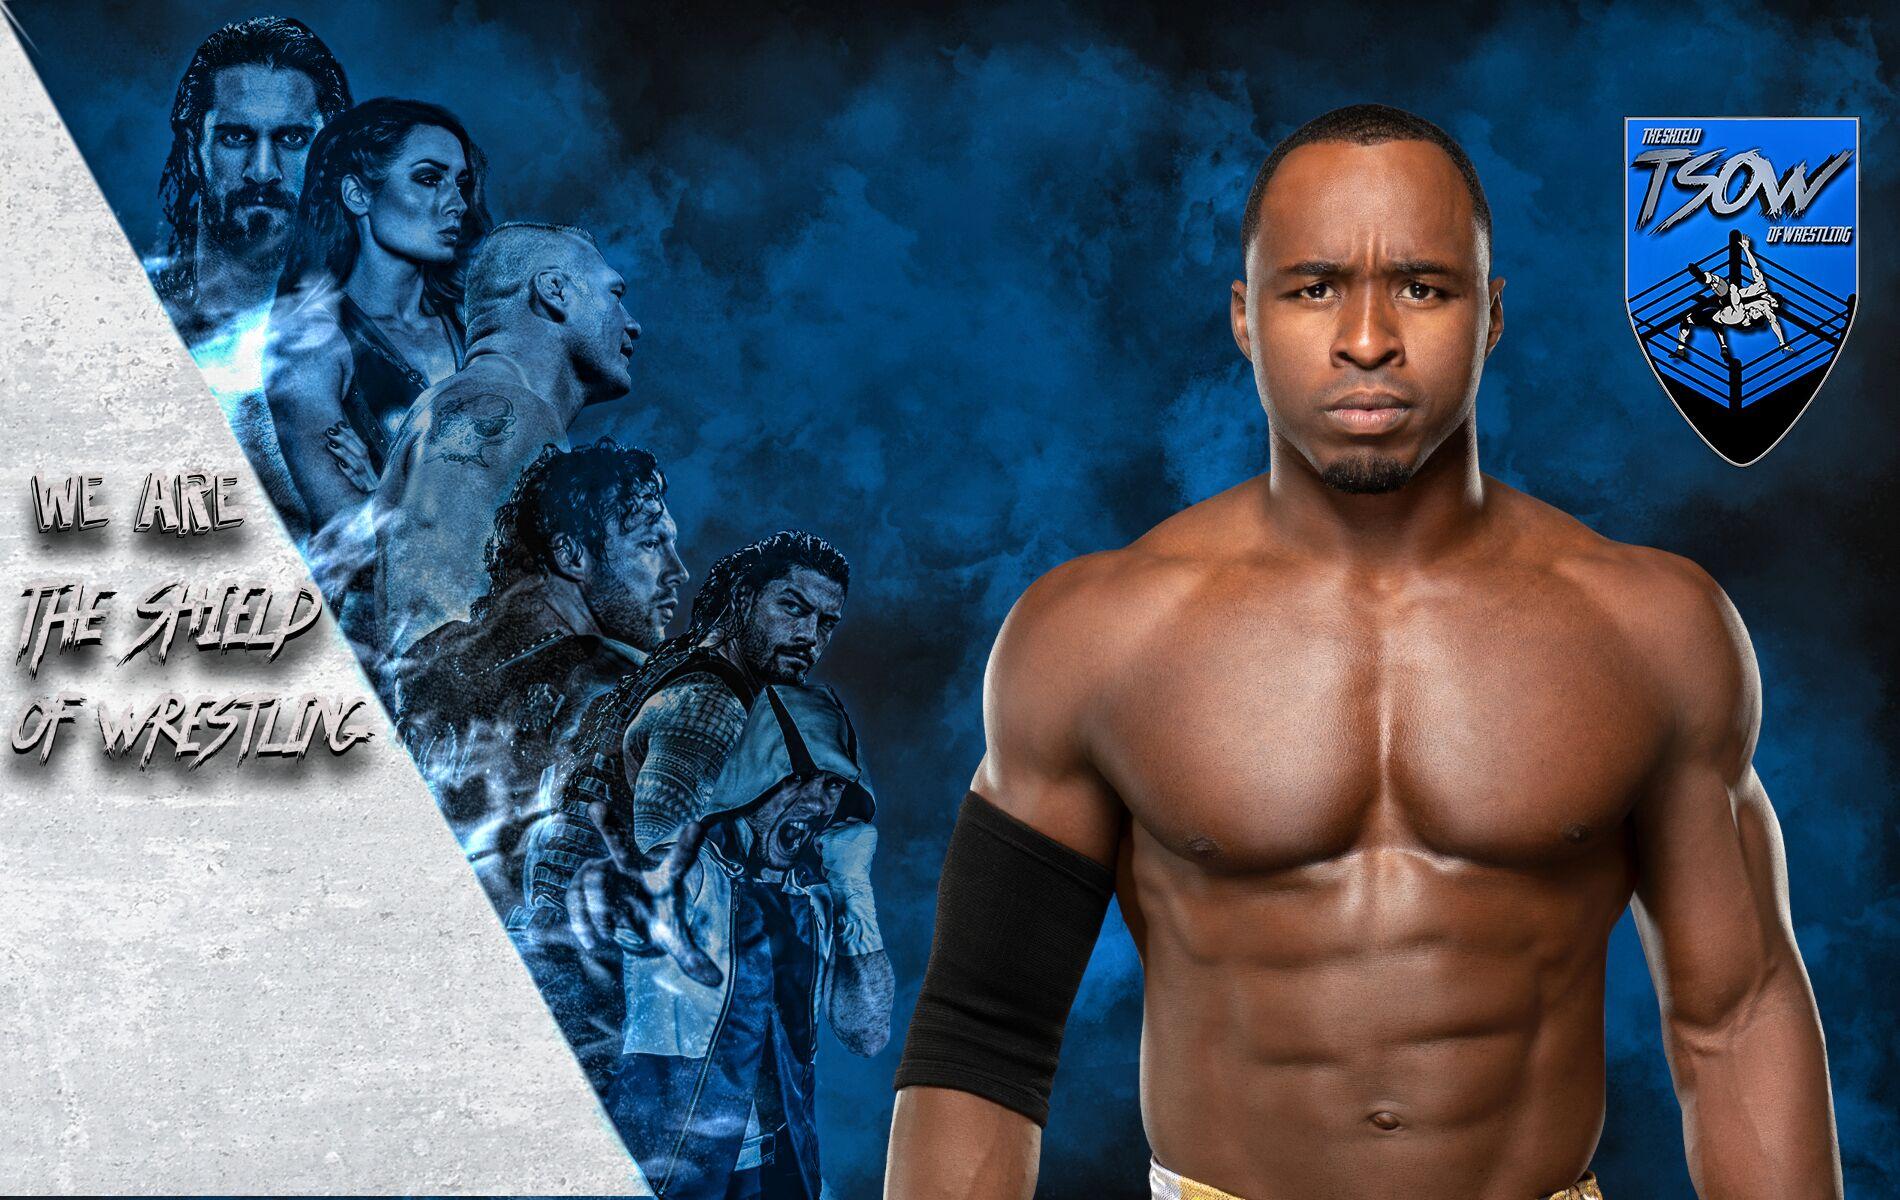 Booker T su Jordan Myles - WWE Hall Of Famer